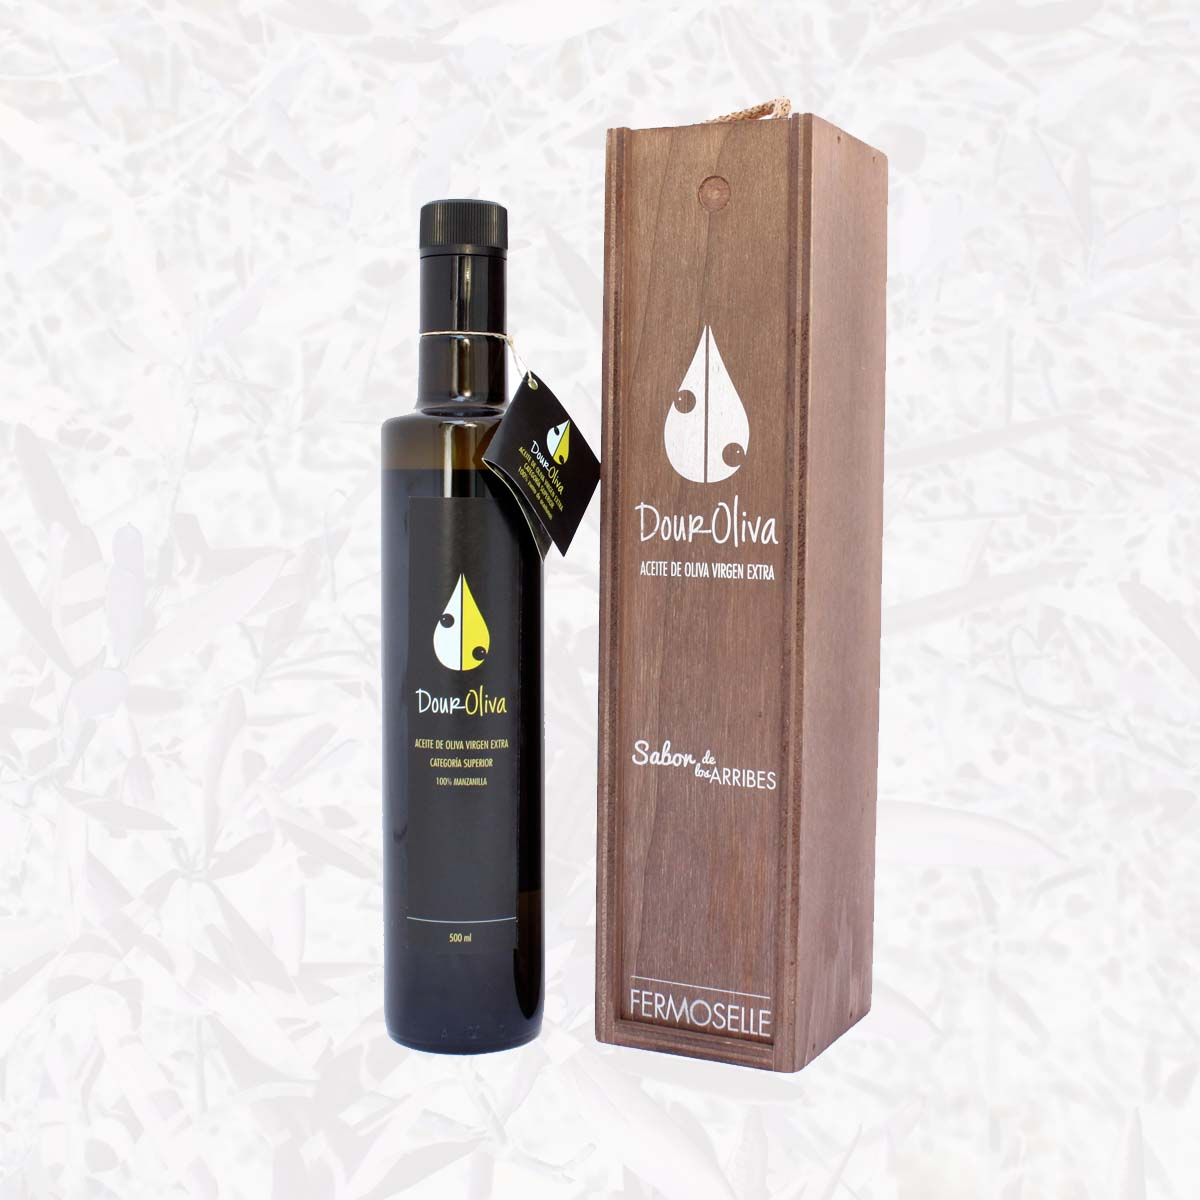 pack-aceite-oliva-douroliva-500ml